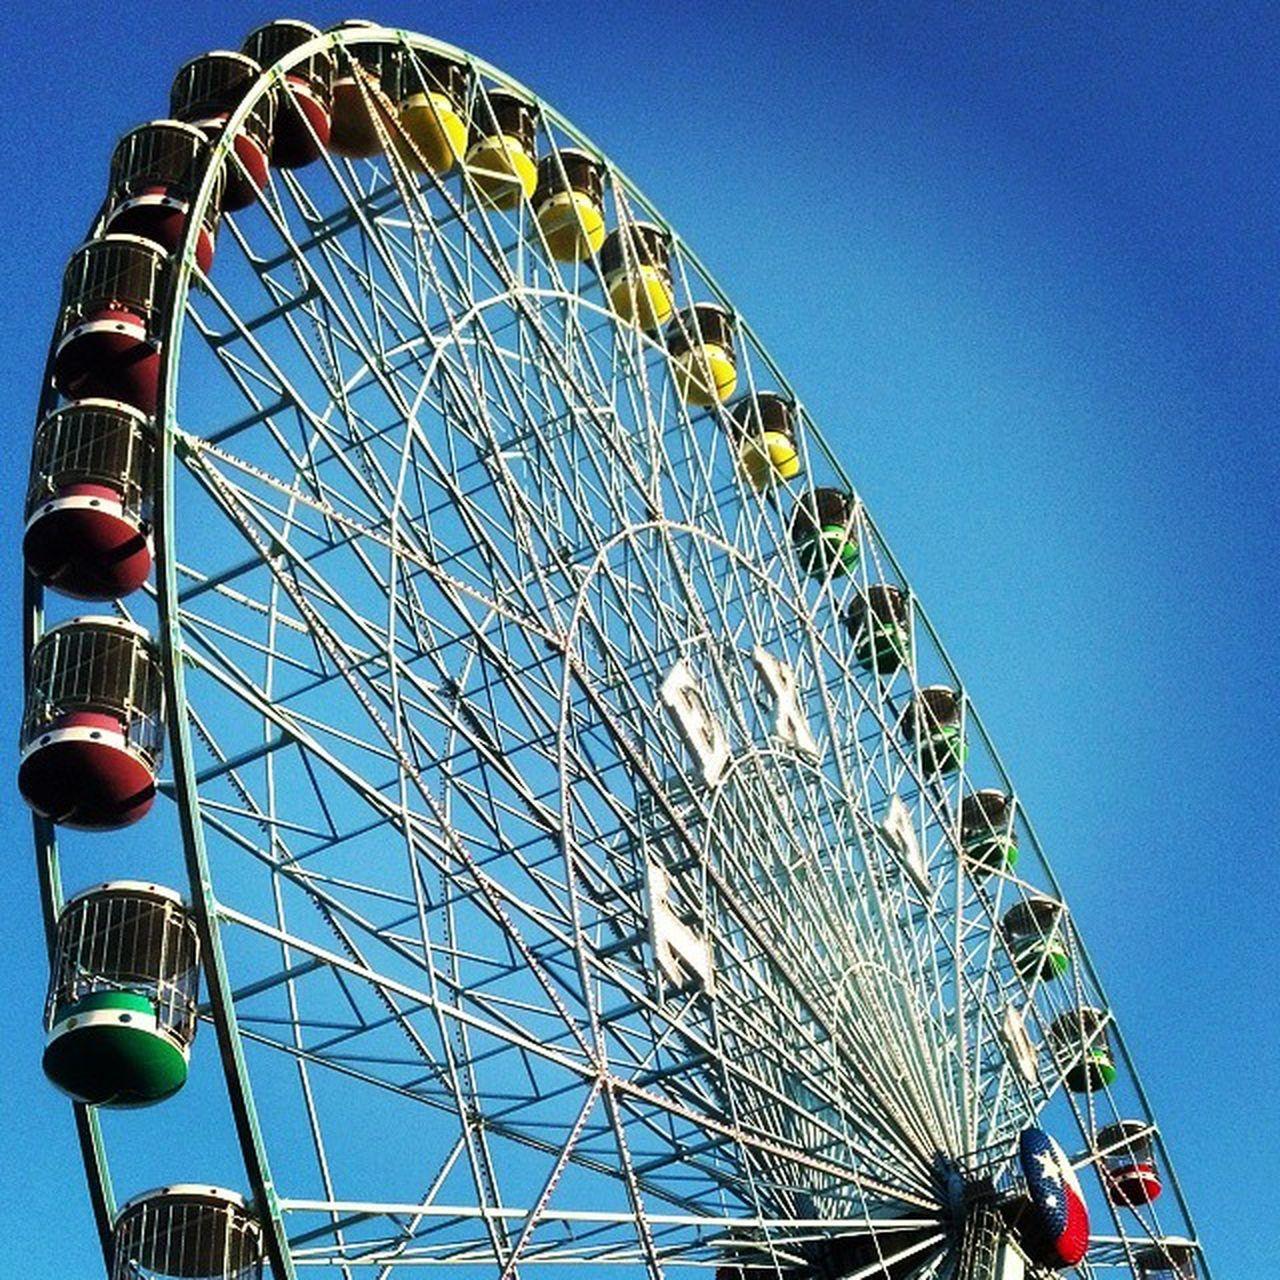 amusement park, arts culture and entertainment, ferris wheel, low angle view, amusement park ride, big wheel, blue, circle, clear sky, no people, built structure, day, sky, outdoors, architecture